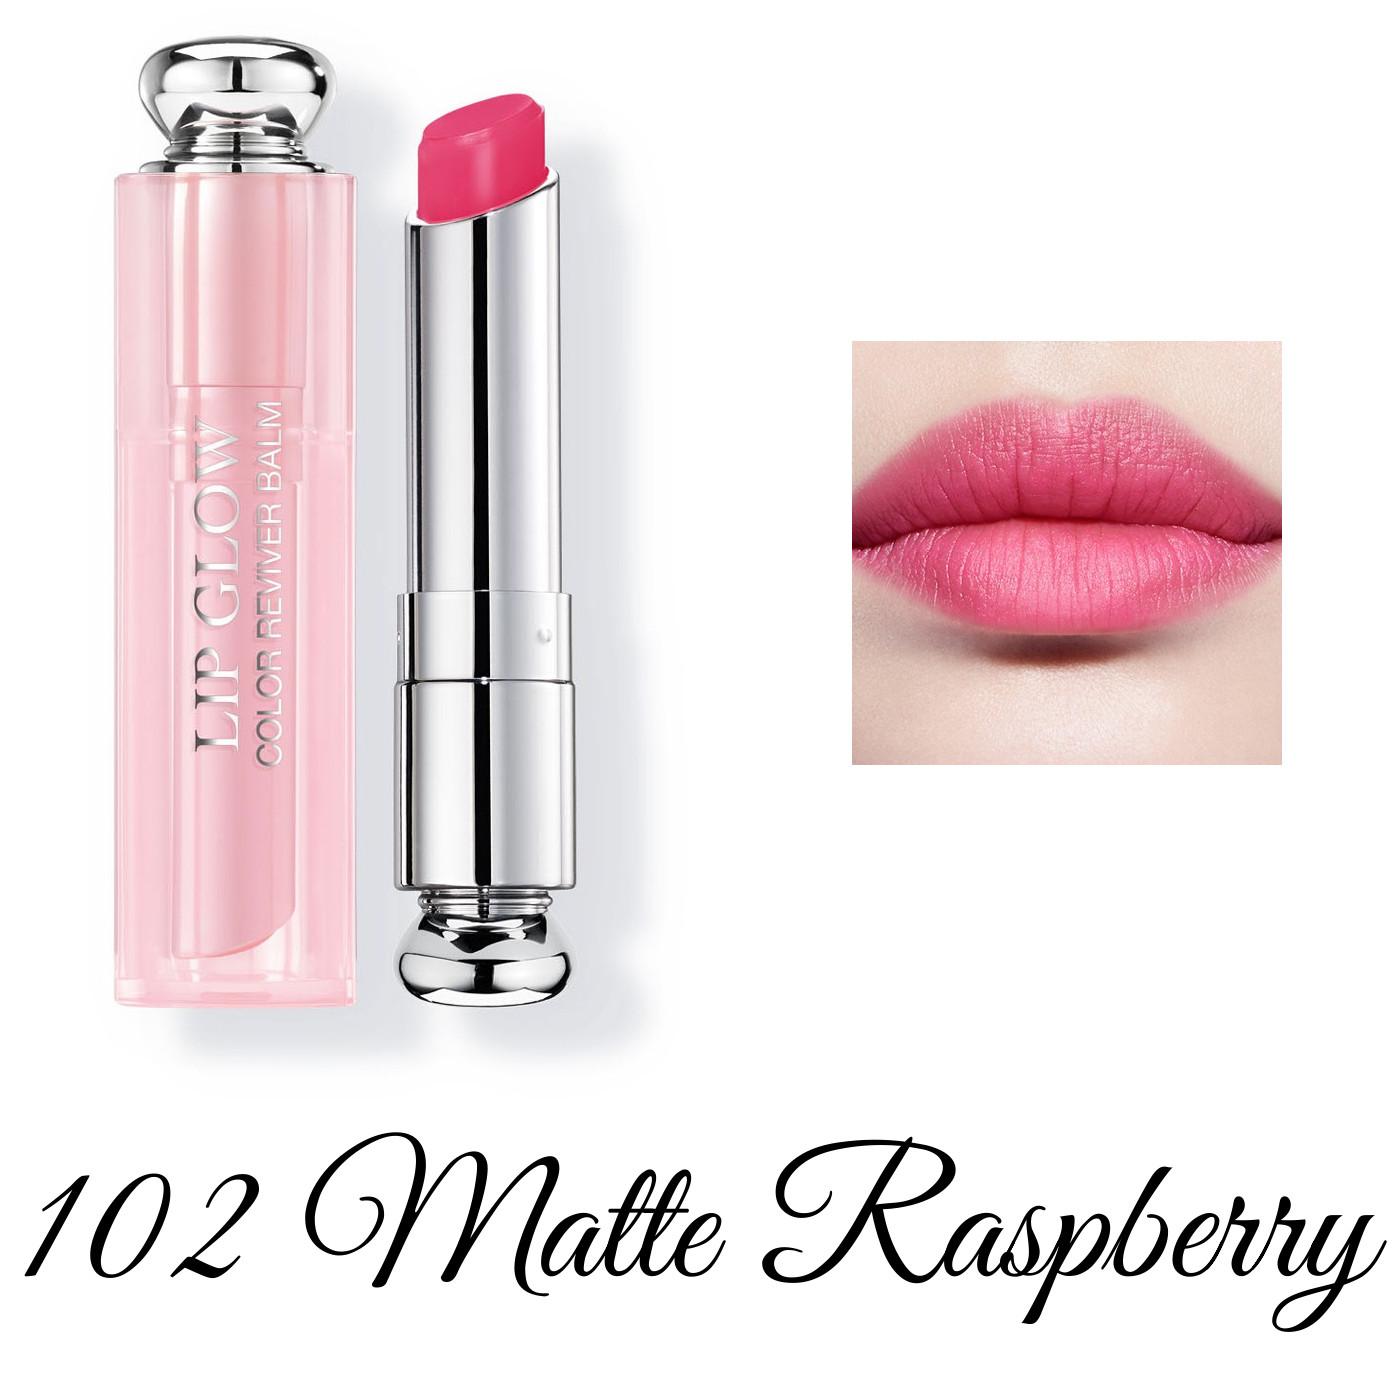 Dior Spring 2018 Collection GLOW ADDICT Dior Addict Lipglow 102 Matte Raspberry